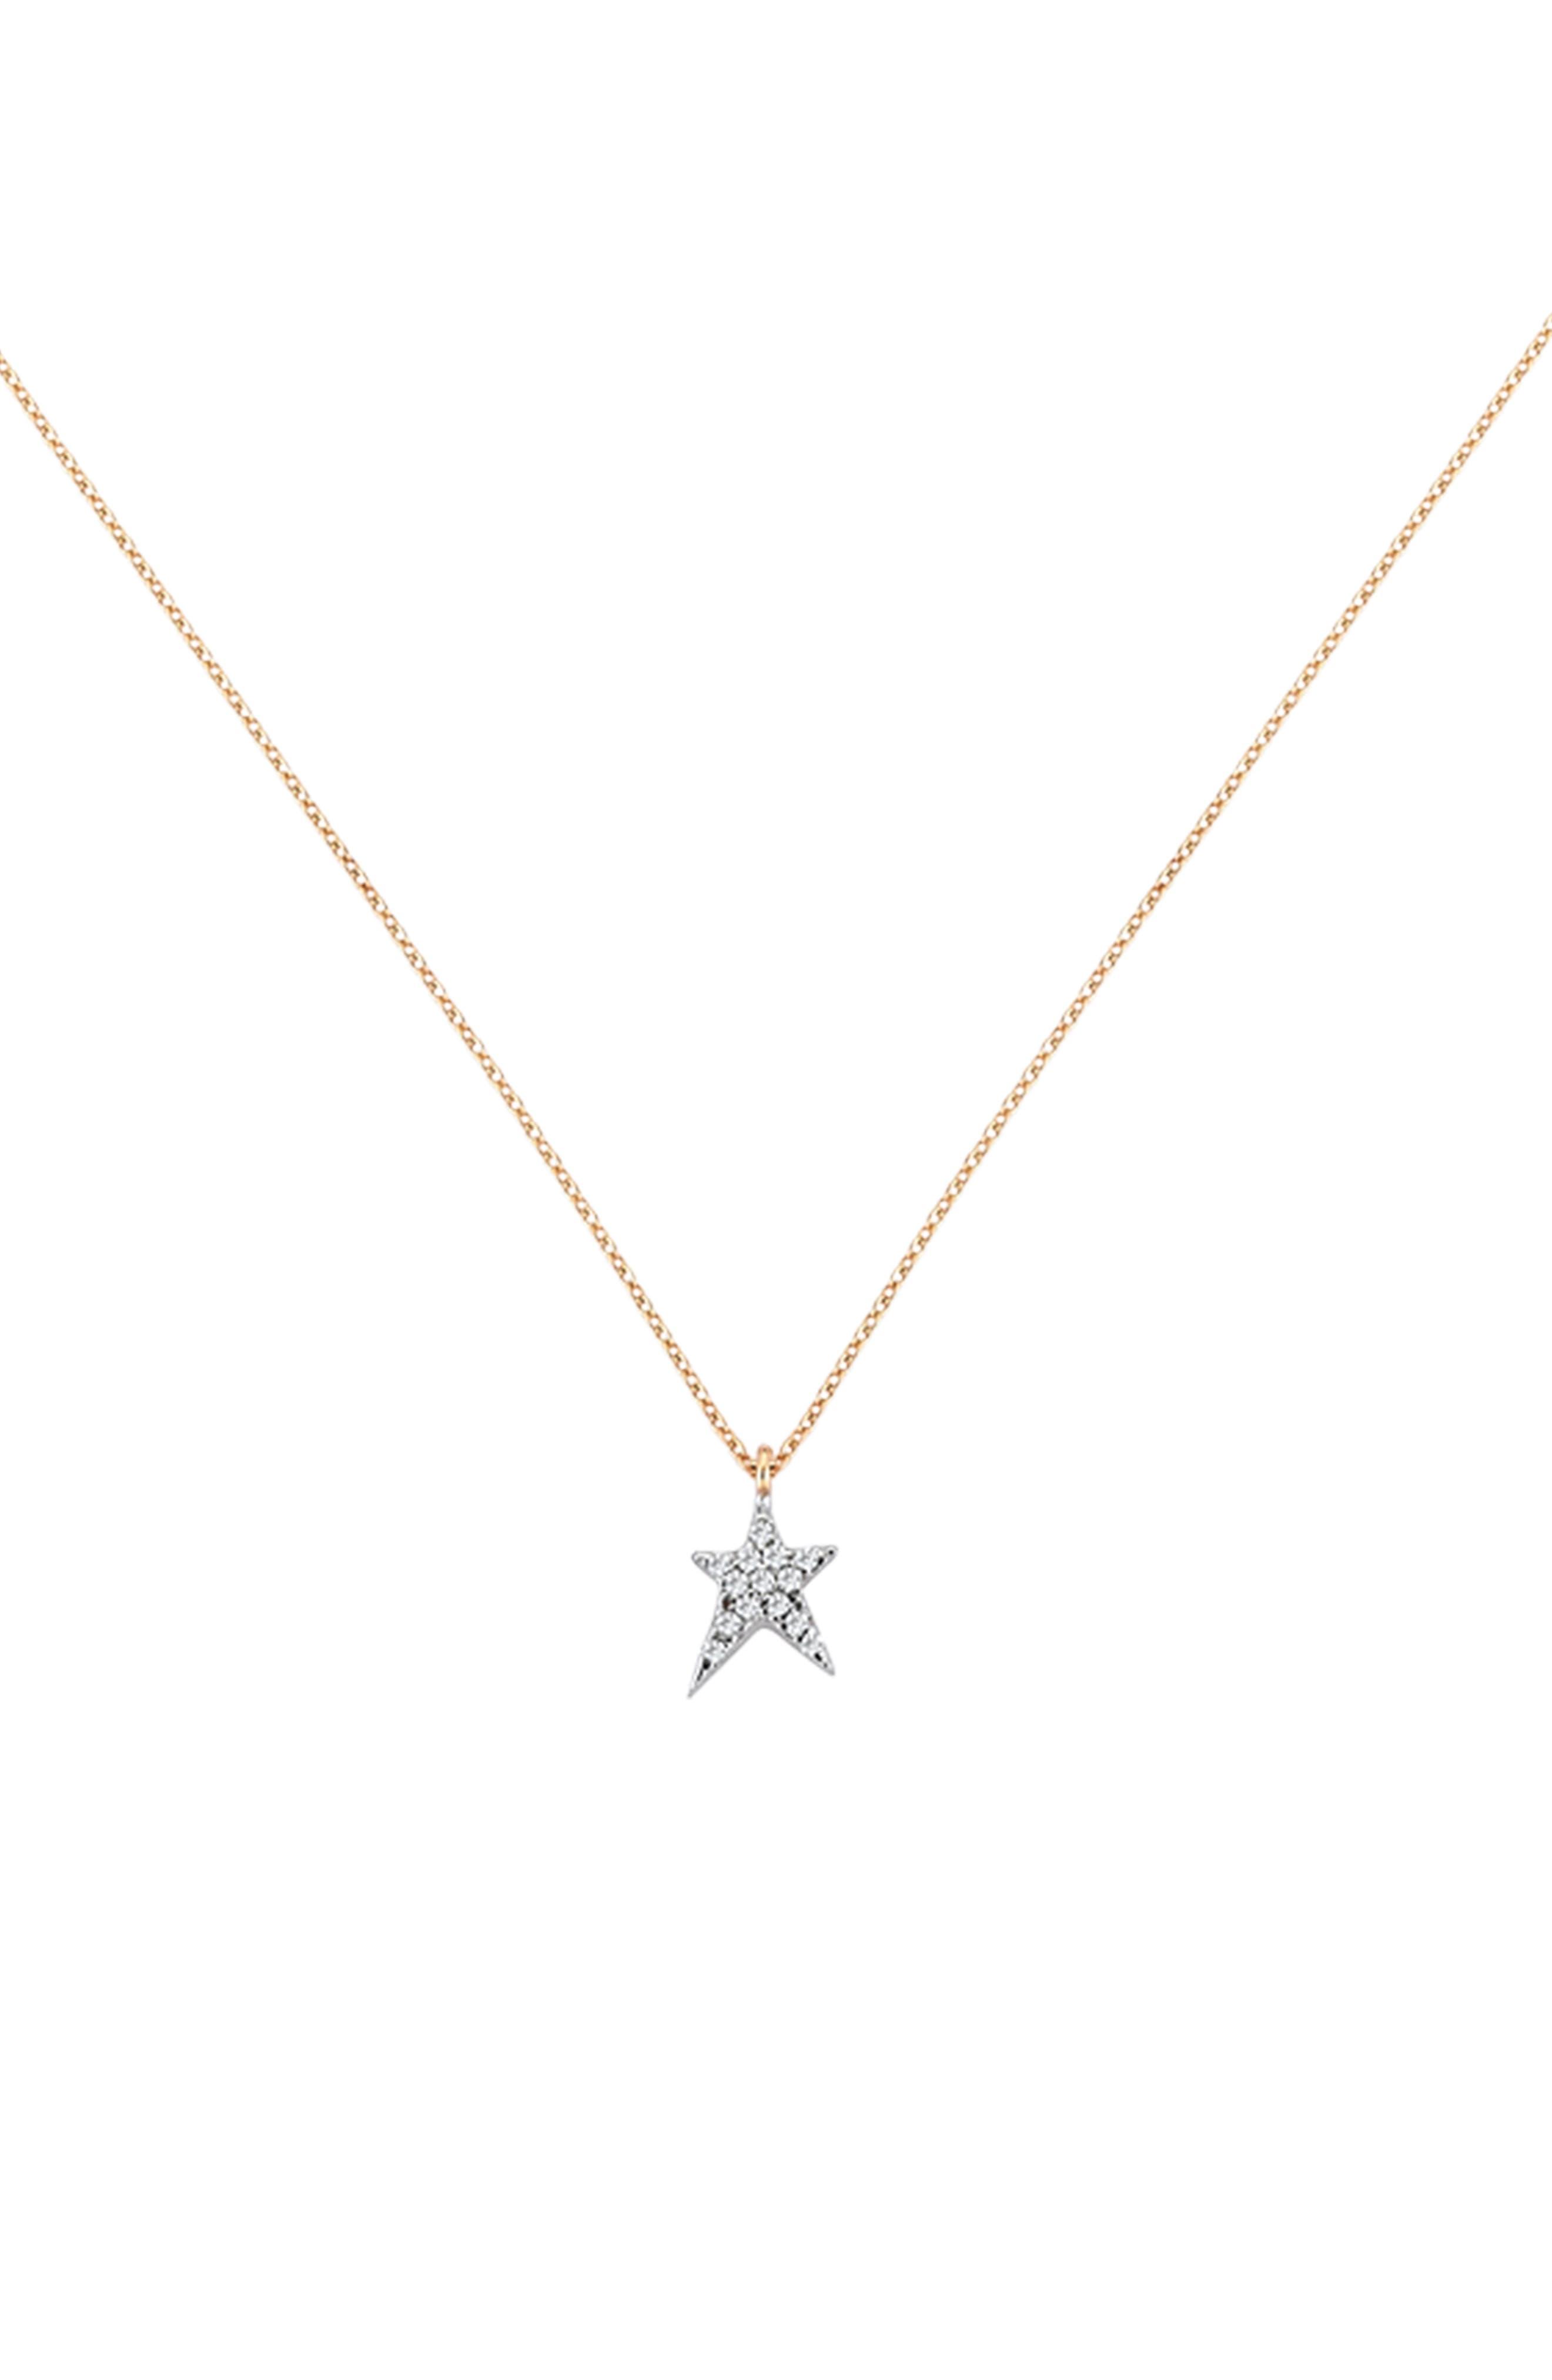 Main Image - Kismet by Milka Diamond Star Pendant Necklace